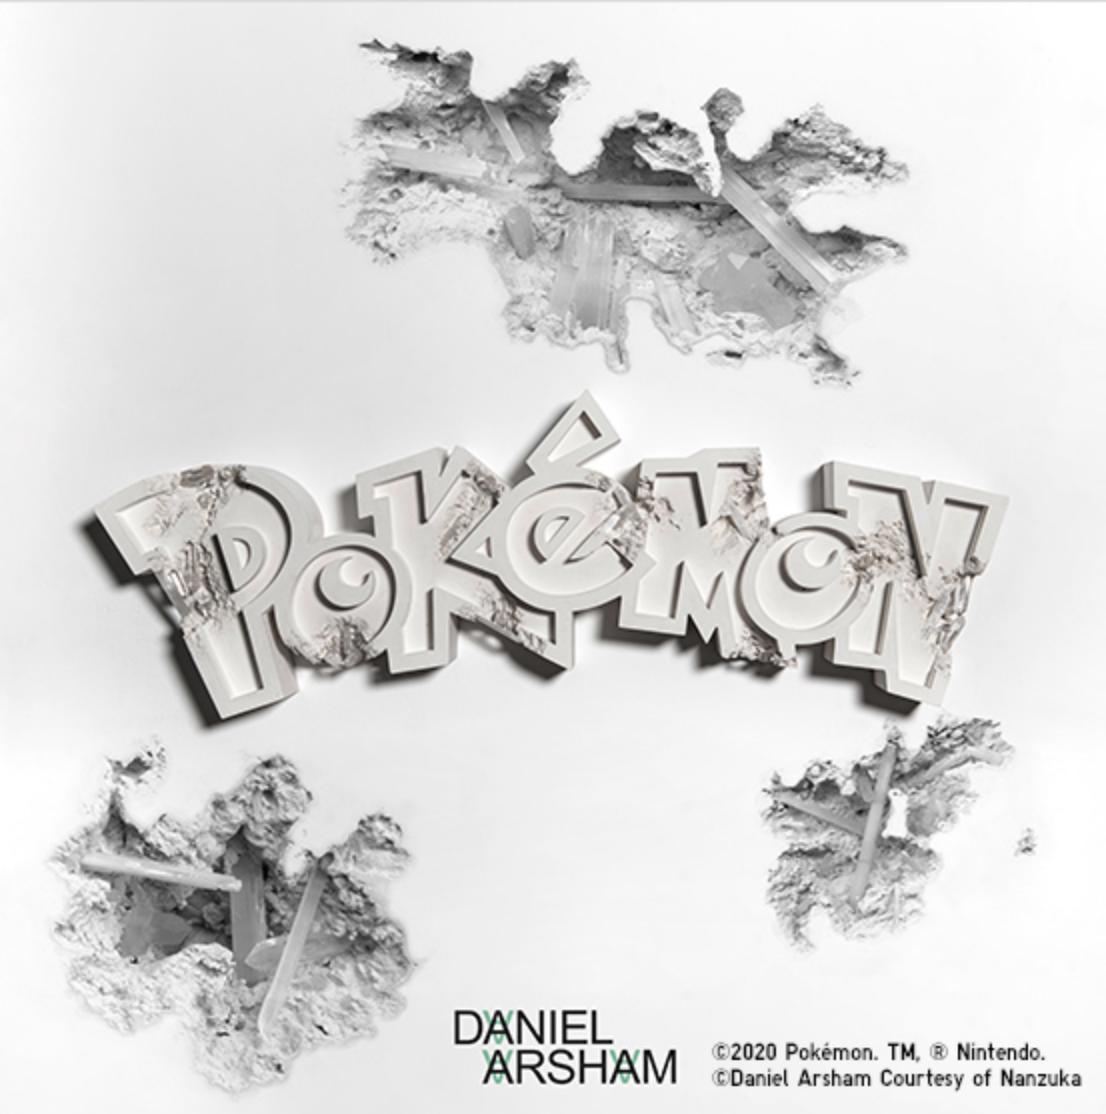 Daniel Arsham xPokémon Collection